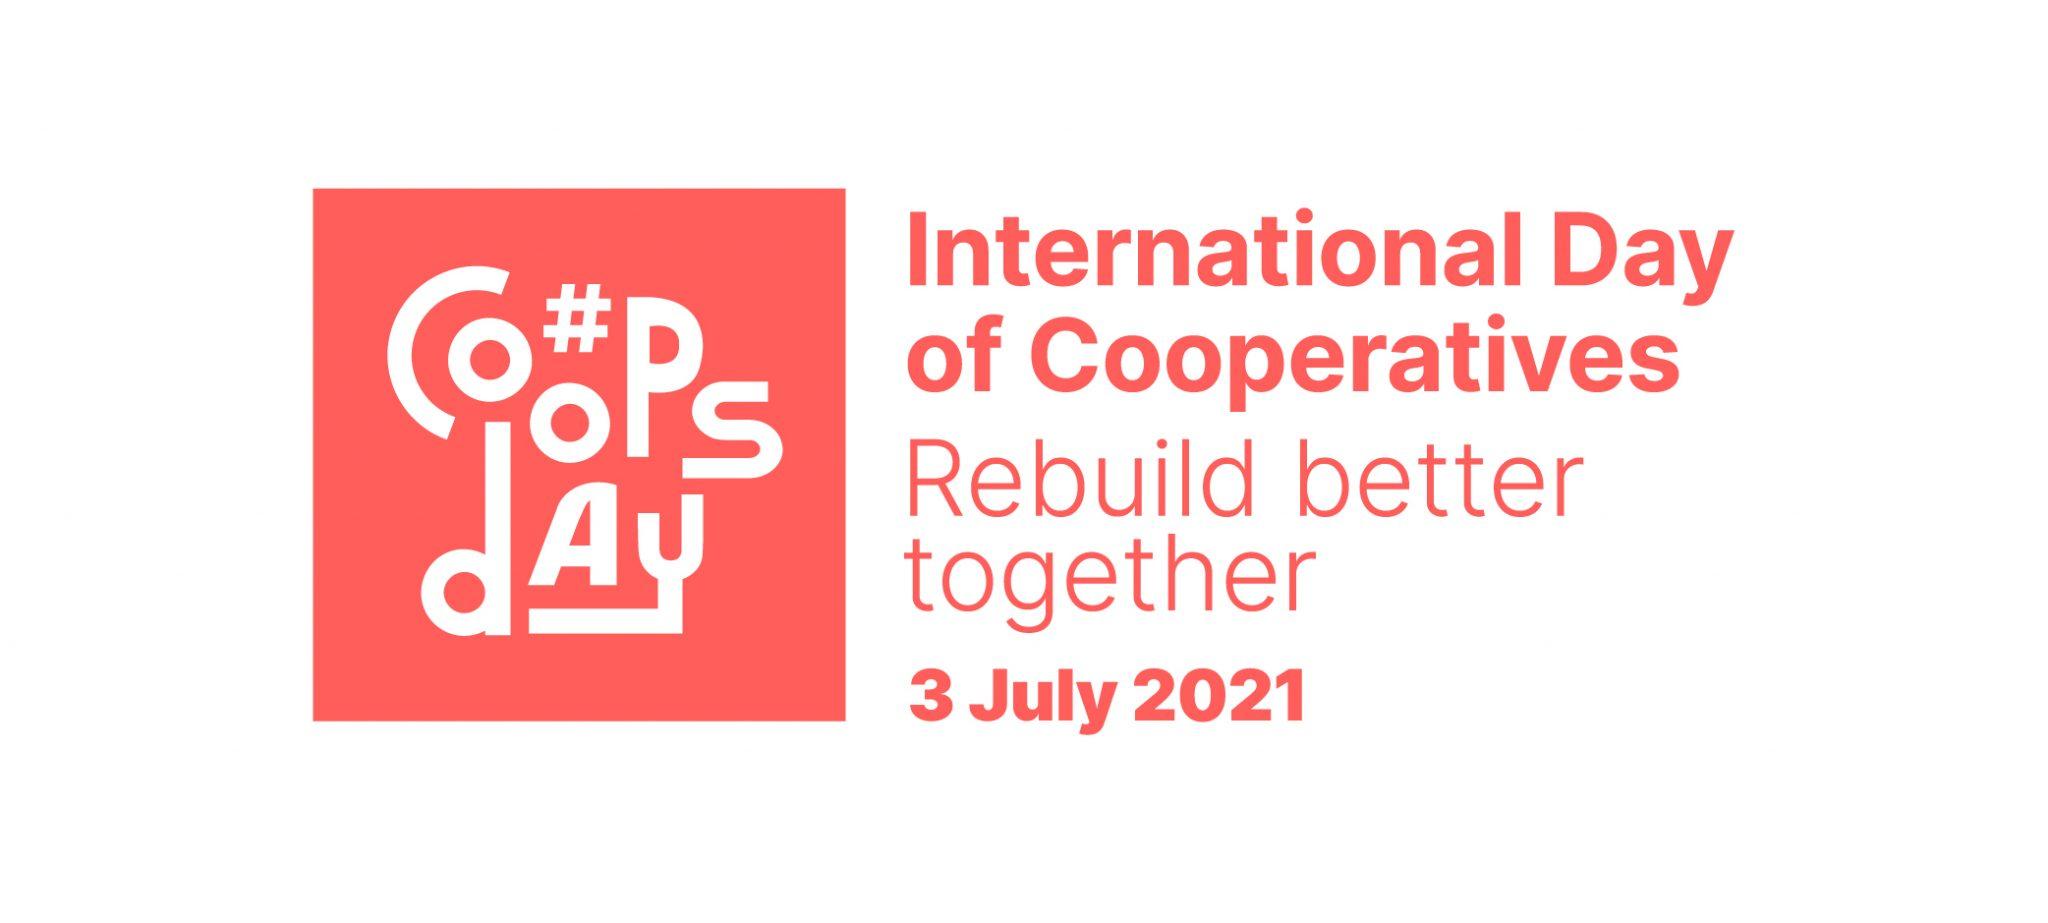 International Day of Cooperatives: 3 July | சர்வதேச கூட்டுறவு தினம்: 3 ஜூலை |_40.1